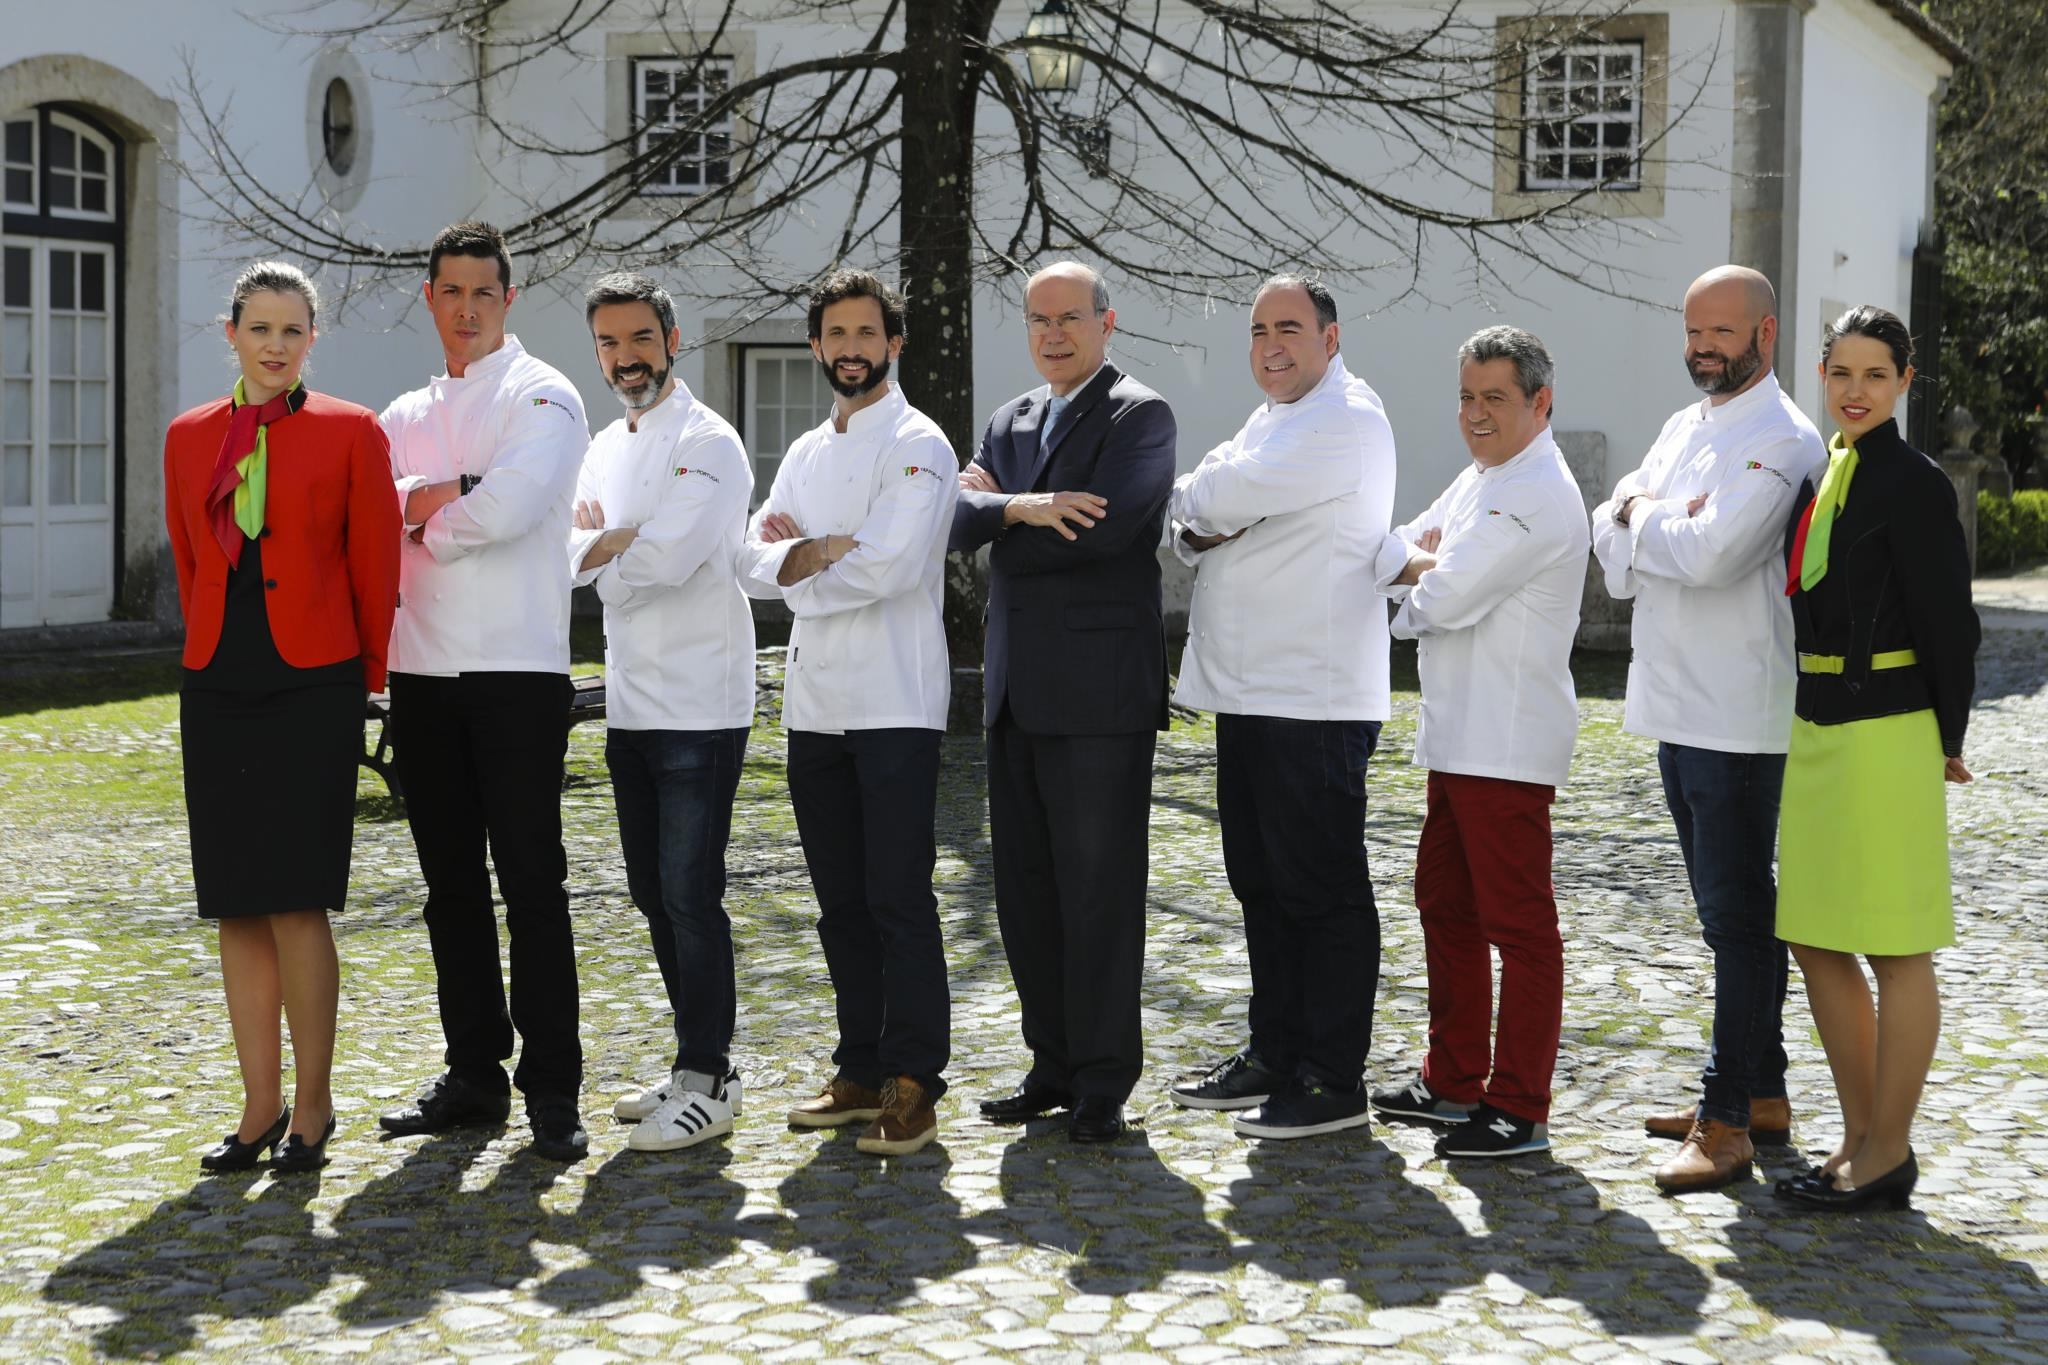 Da esquerda para a direita, Rui Silvestre, Henrique Sá Pessoa, José Alvillez, Fernando Pinto, Vítor Sobral, Rui Paula e Miguel Laffan